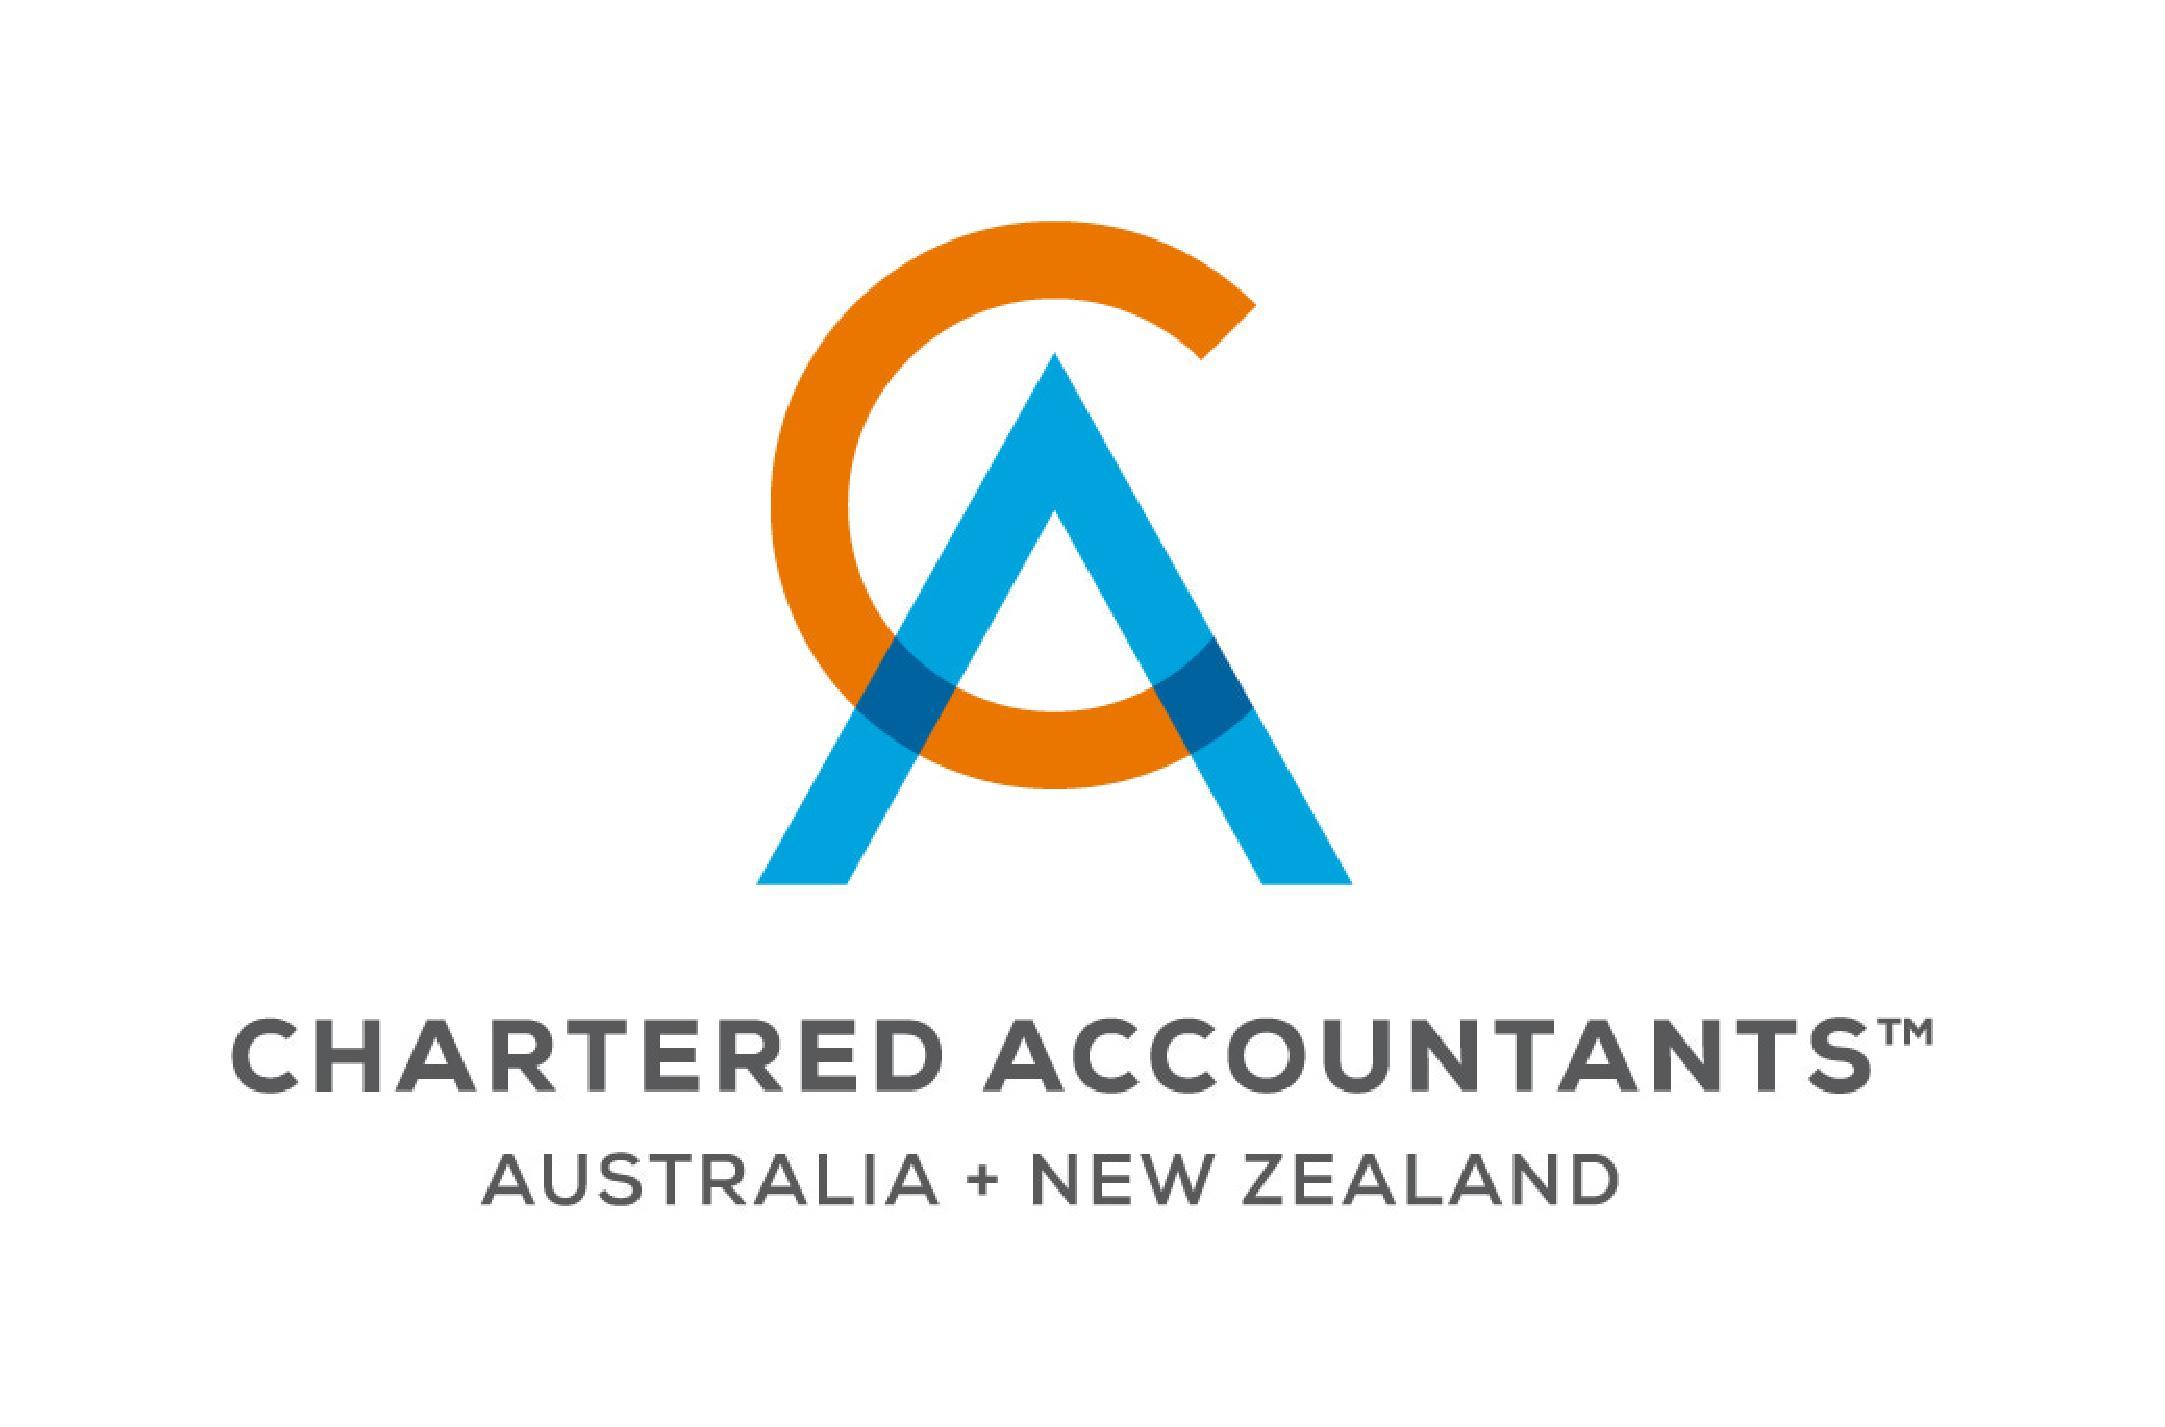 Chartered Accounts Australia New Zealand logo.